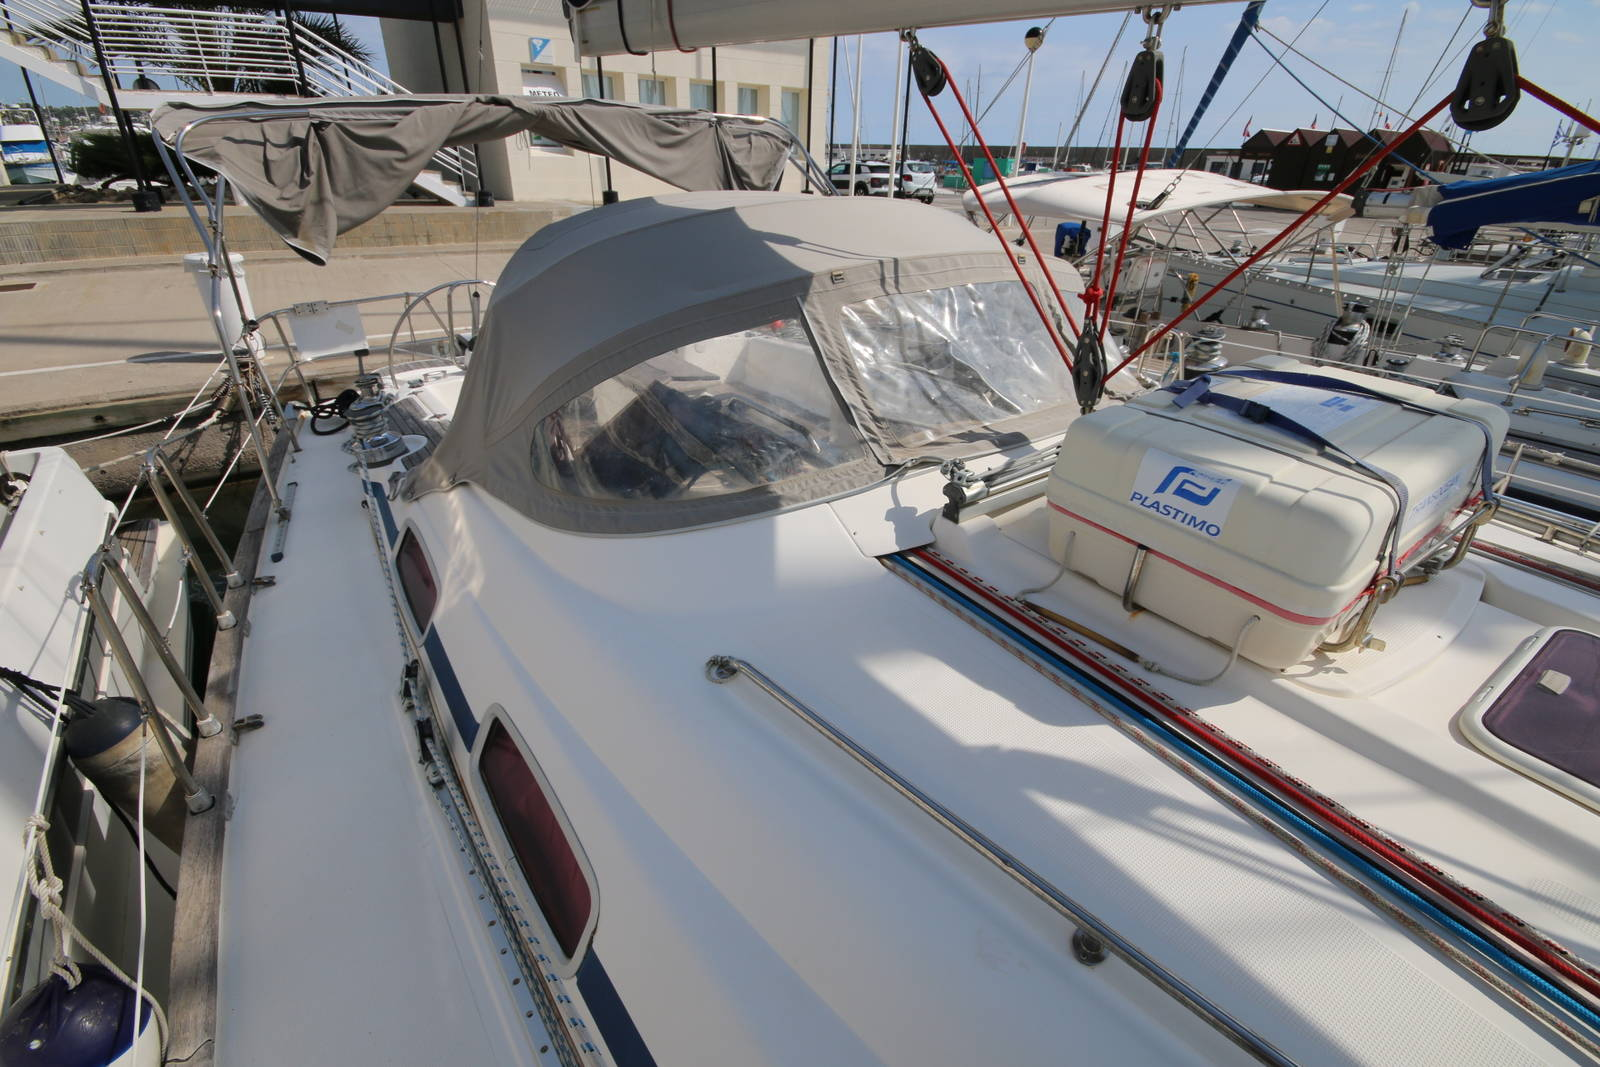 Bavaria 46 Yacht Deck on Boat 1